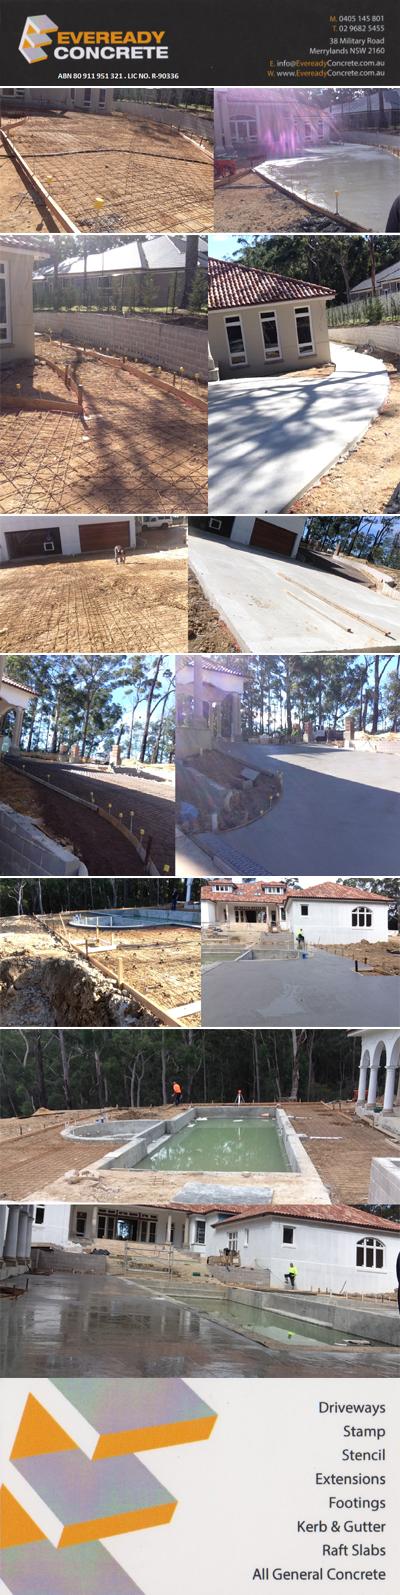 Eveready Concrete